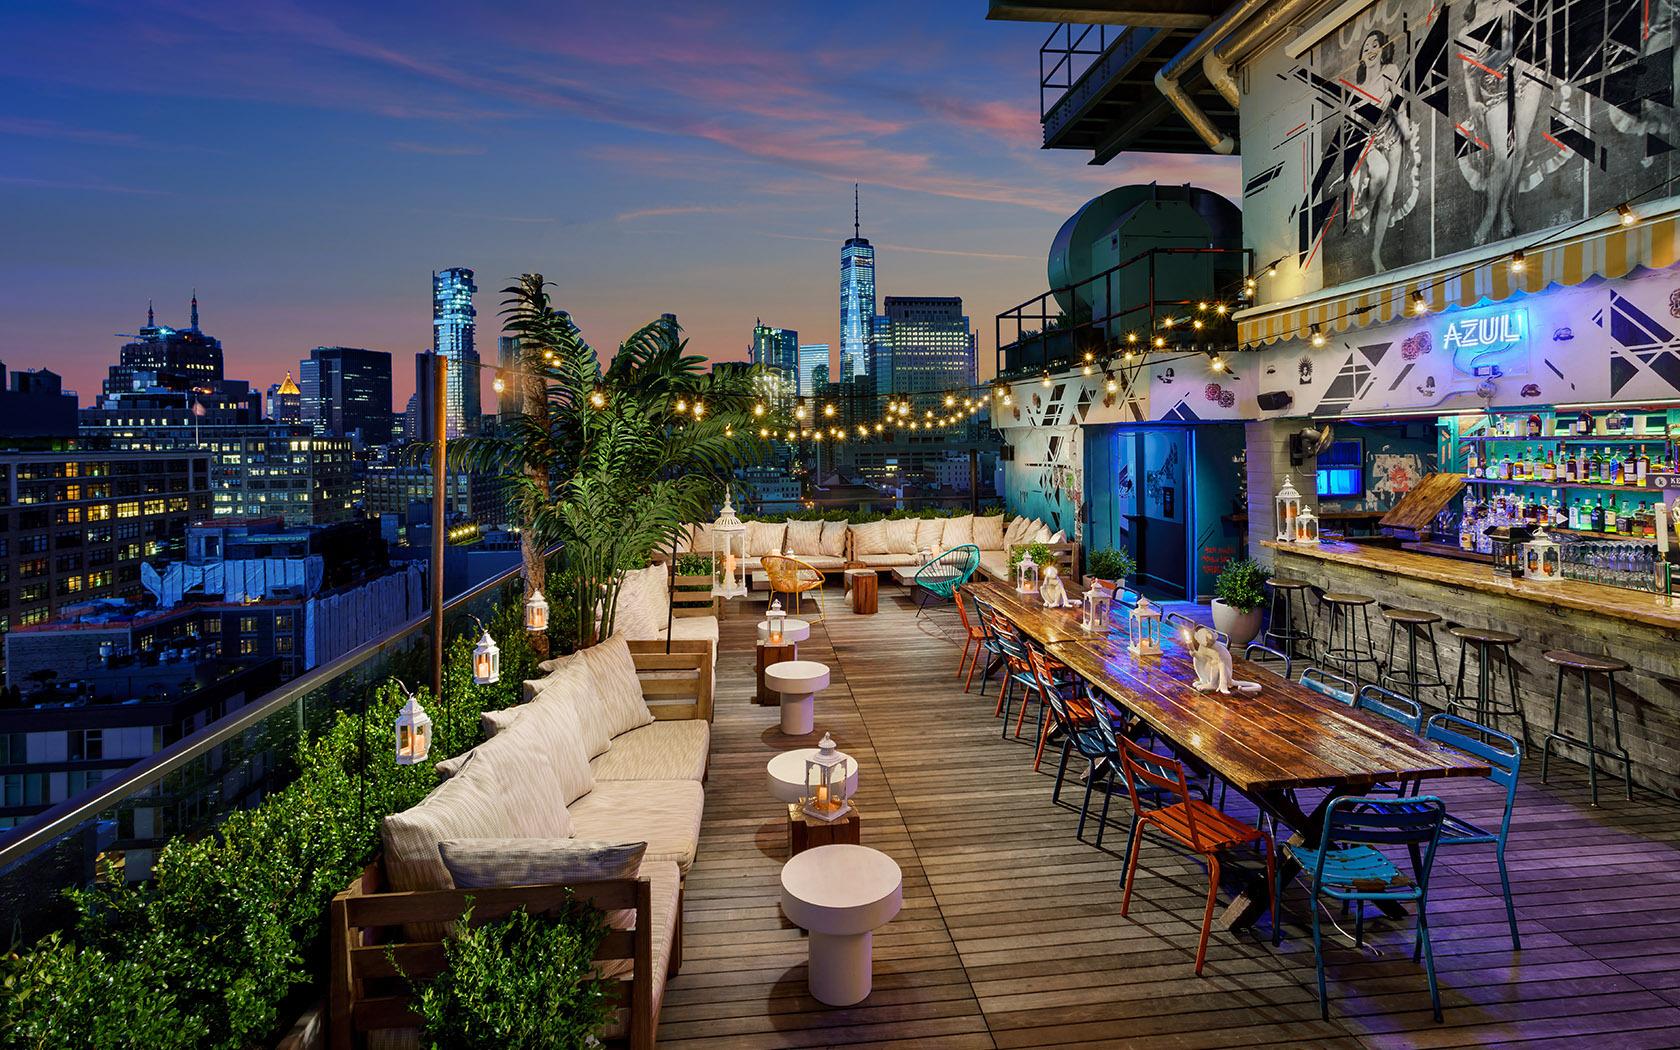 Azul Rooftop - New York, NY 10013 - (212)608-4848 | ShowMeLocal.com